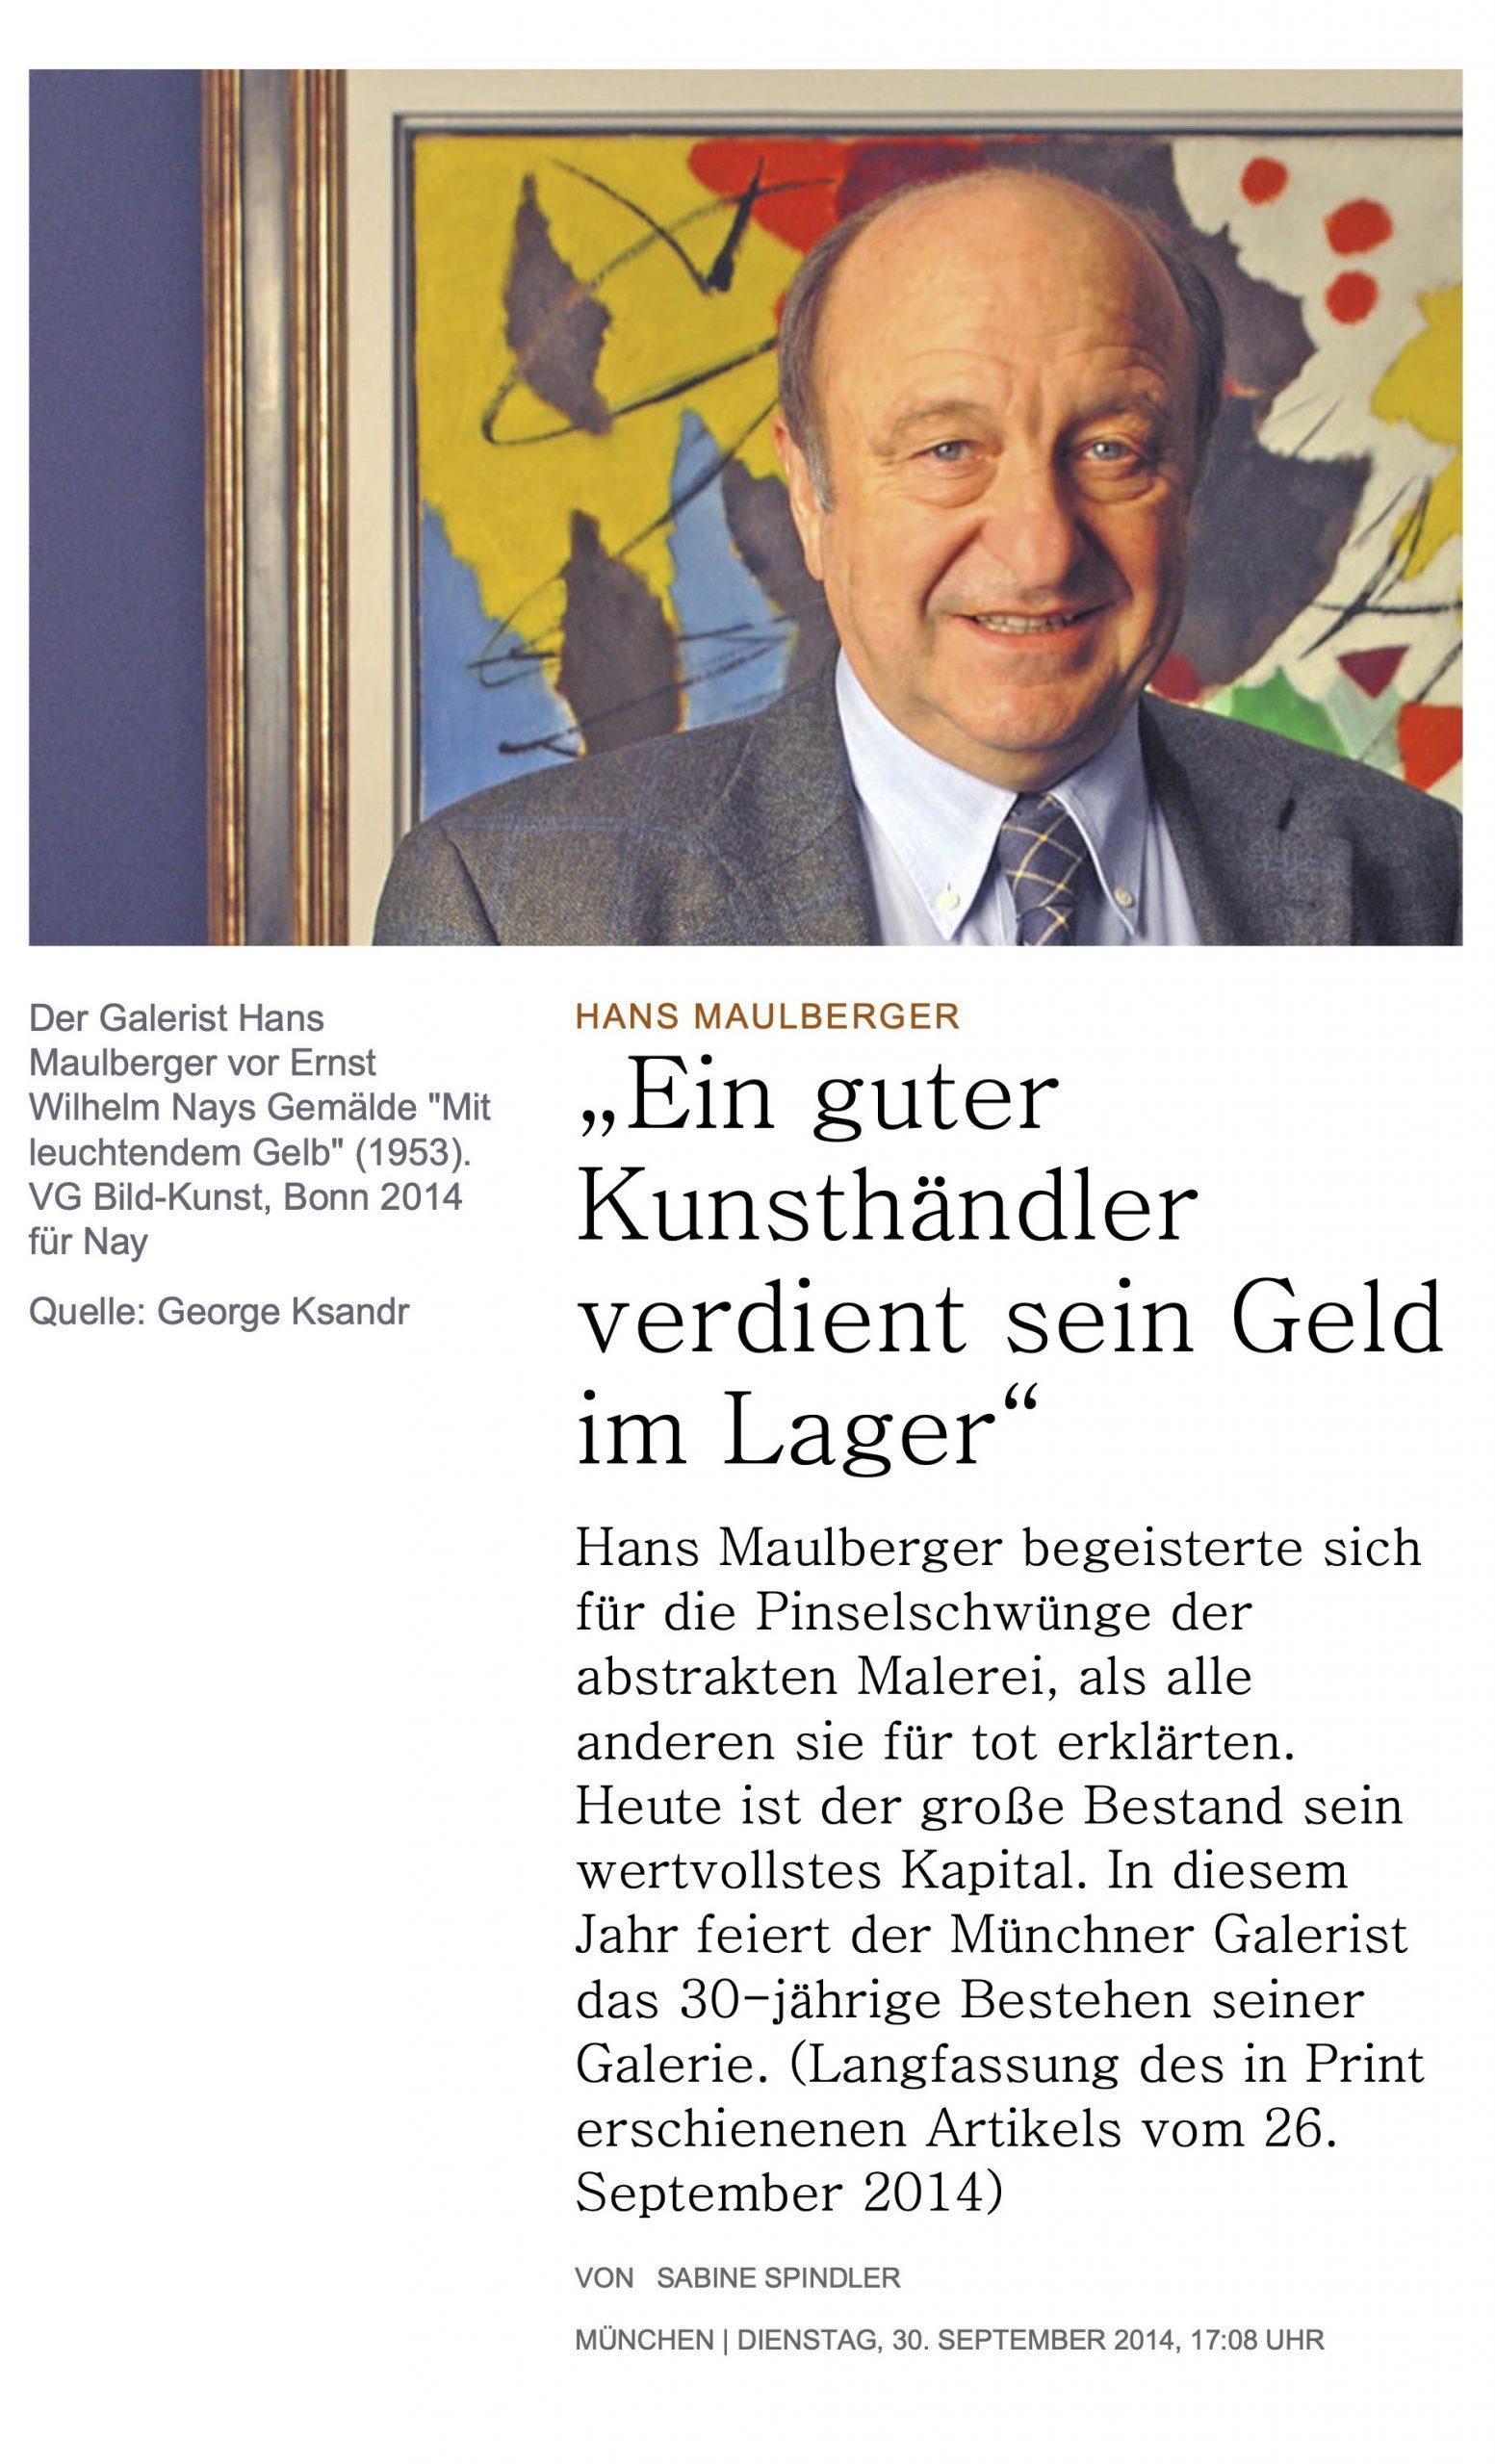 Presse Galerie Maulberger Handelsblatt 2014 01